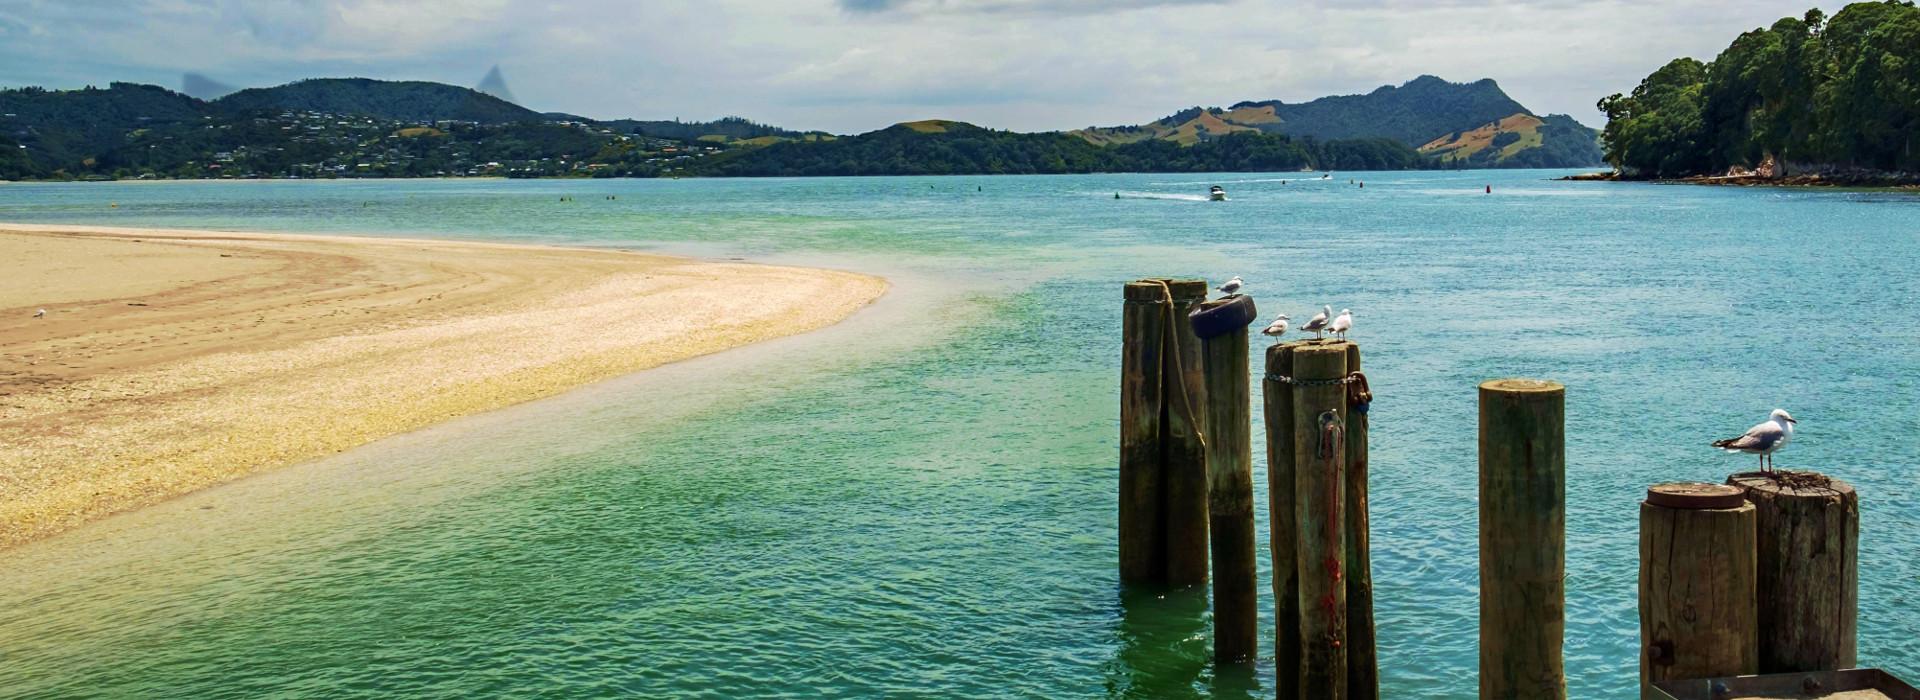 Mercury Bay at Whitianga on New Zealand's Coromandel Peninsula.